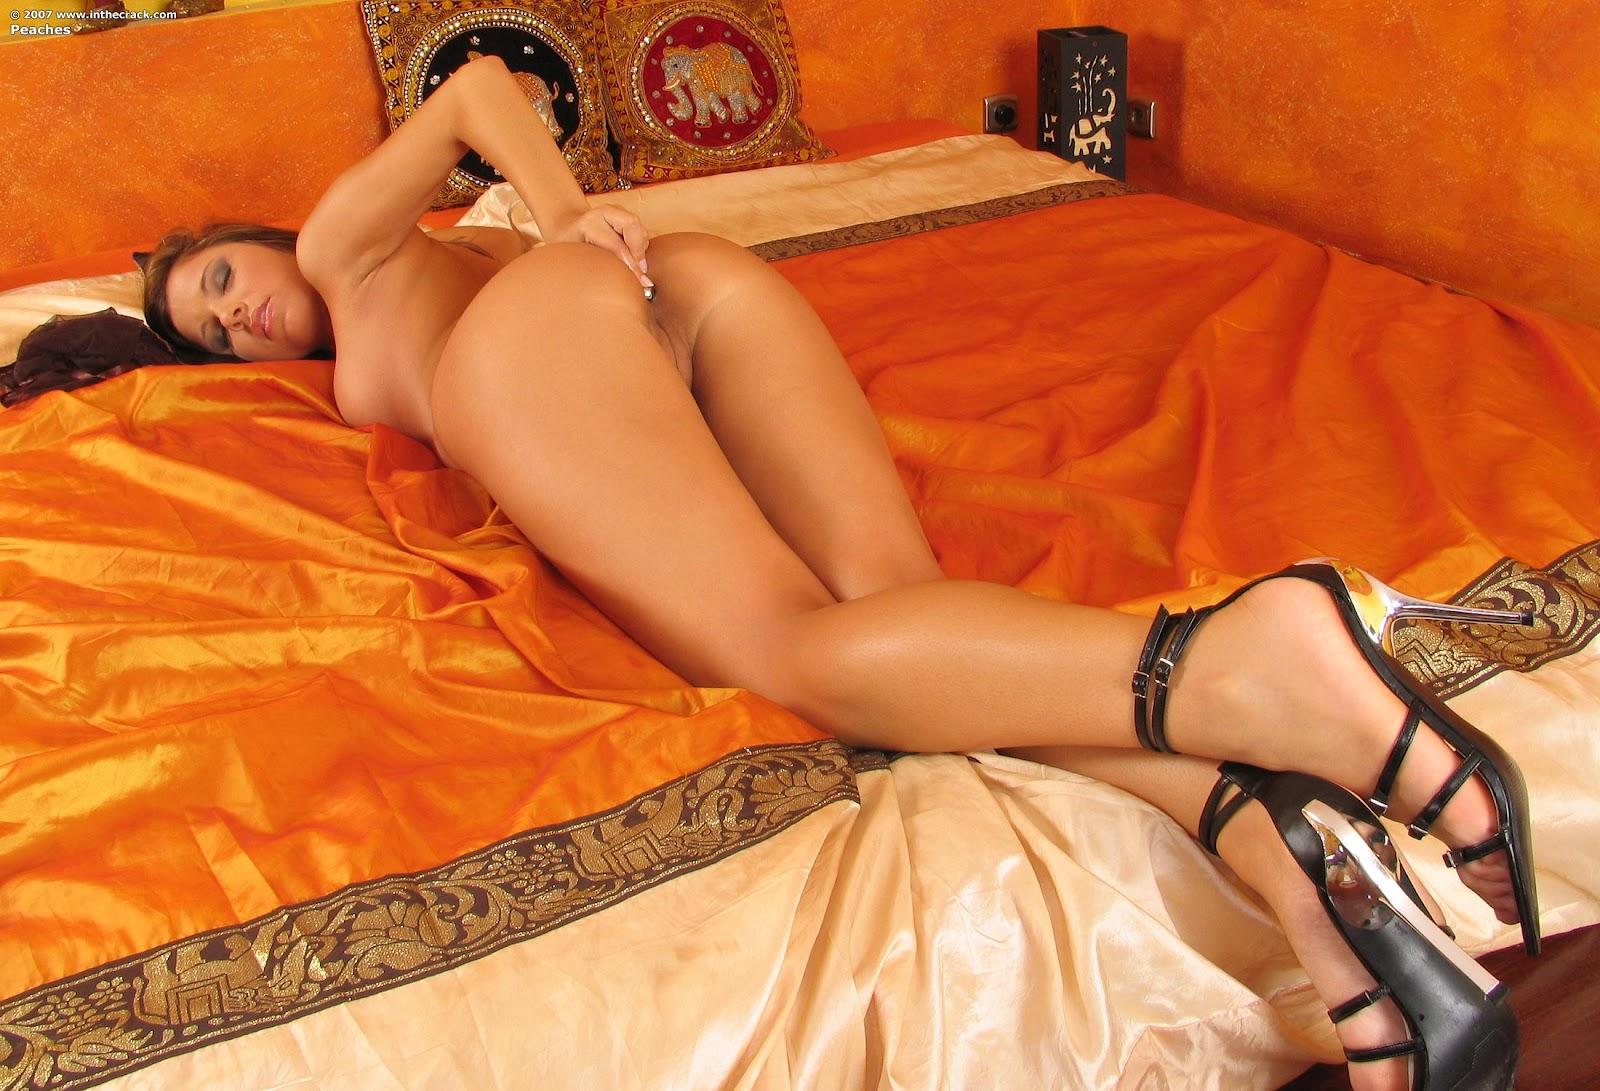 http://4.bp.blogspot.com/-GtP2HTi4Vxs/T4r_yYneCdI/AAAAAAAAJNg/_5fC1OwcPg4/s1600/inthecrack_126_peaches_complete_full_size_picture_set+(66).jpg